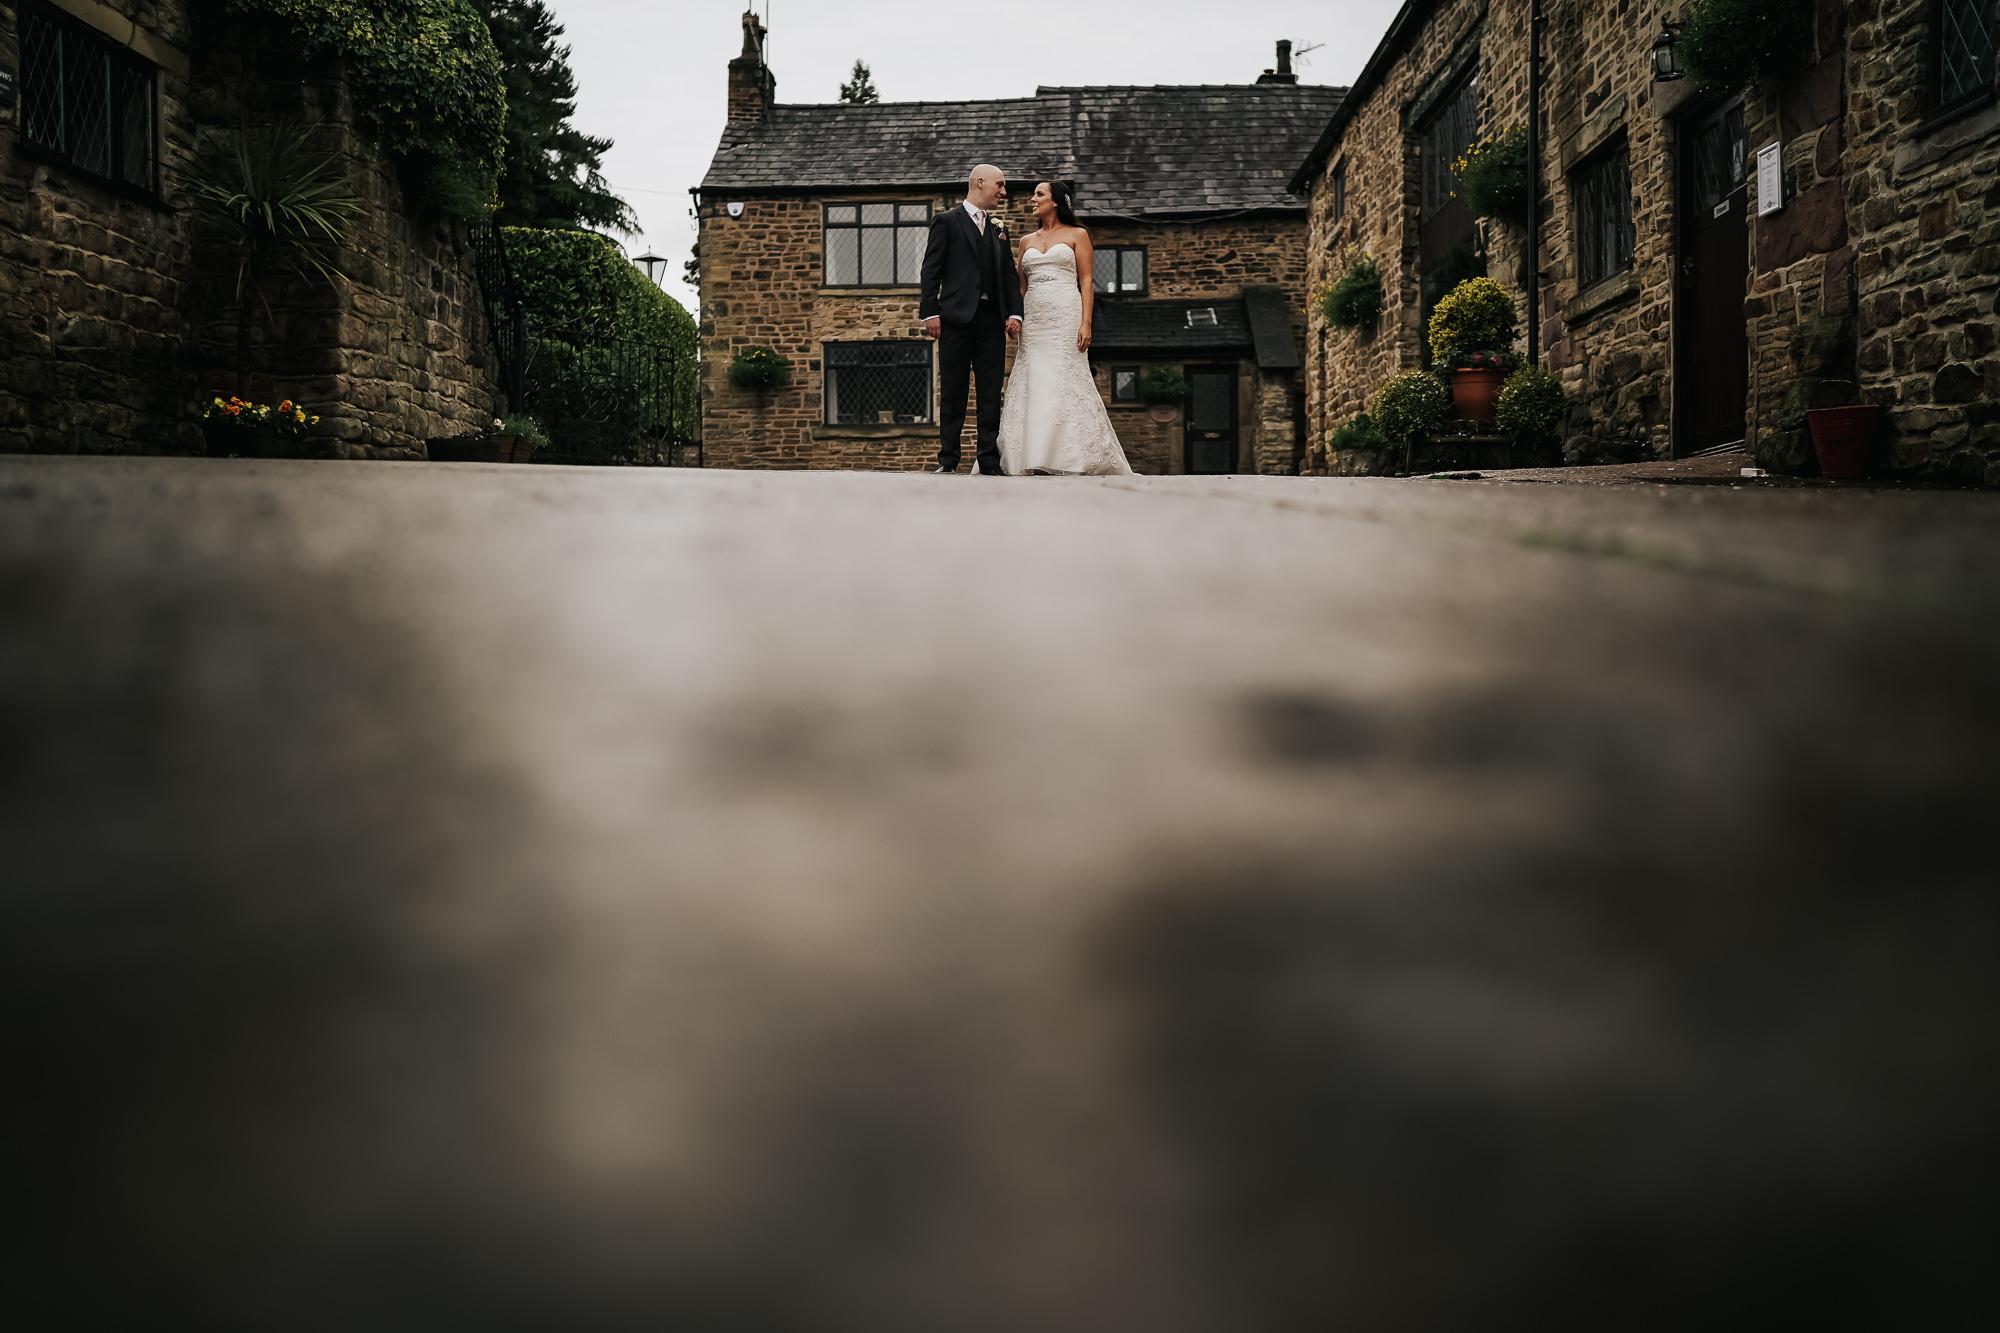 Hyde Bank Farm Wedding Photography Manchester wedding photographer (44 of 49).jpg